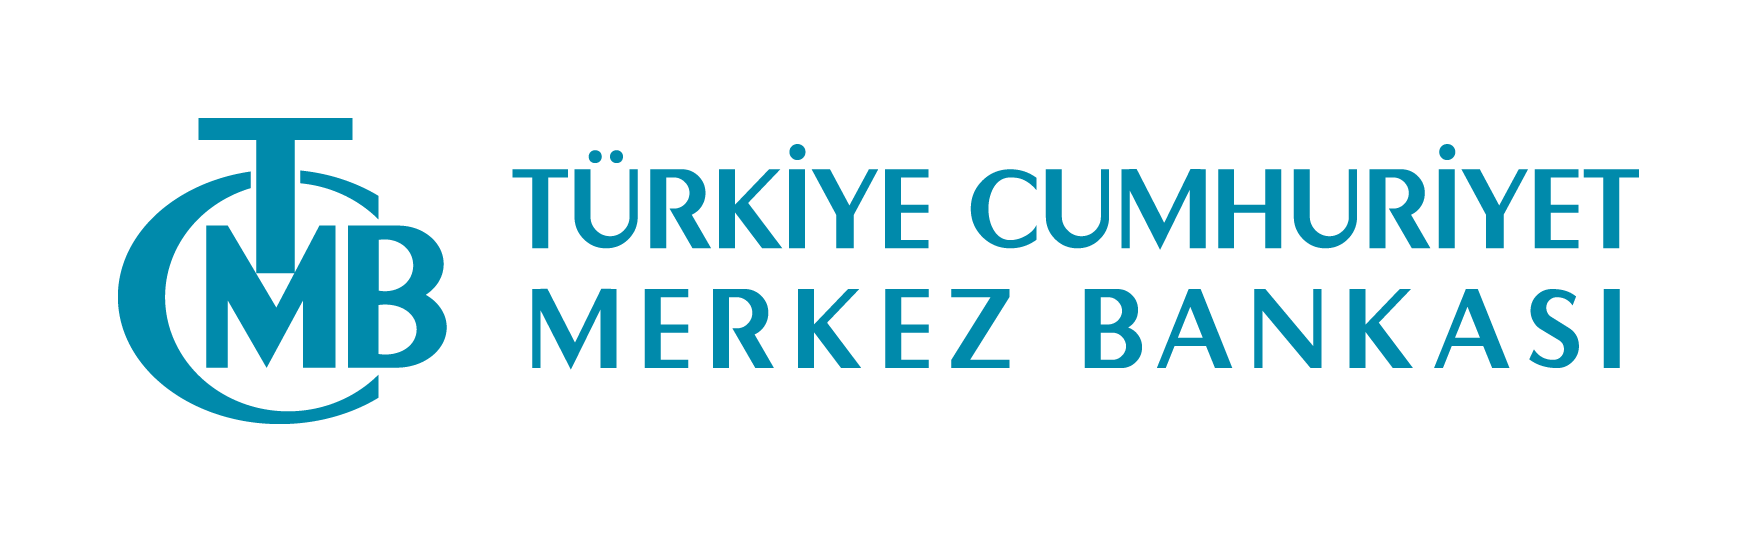 Tcmb Logo